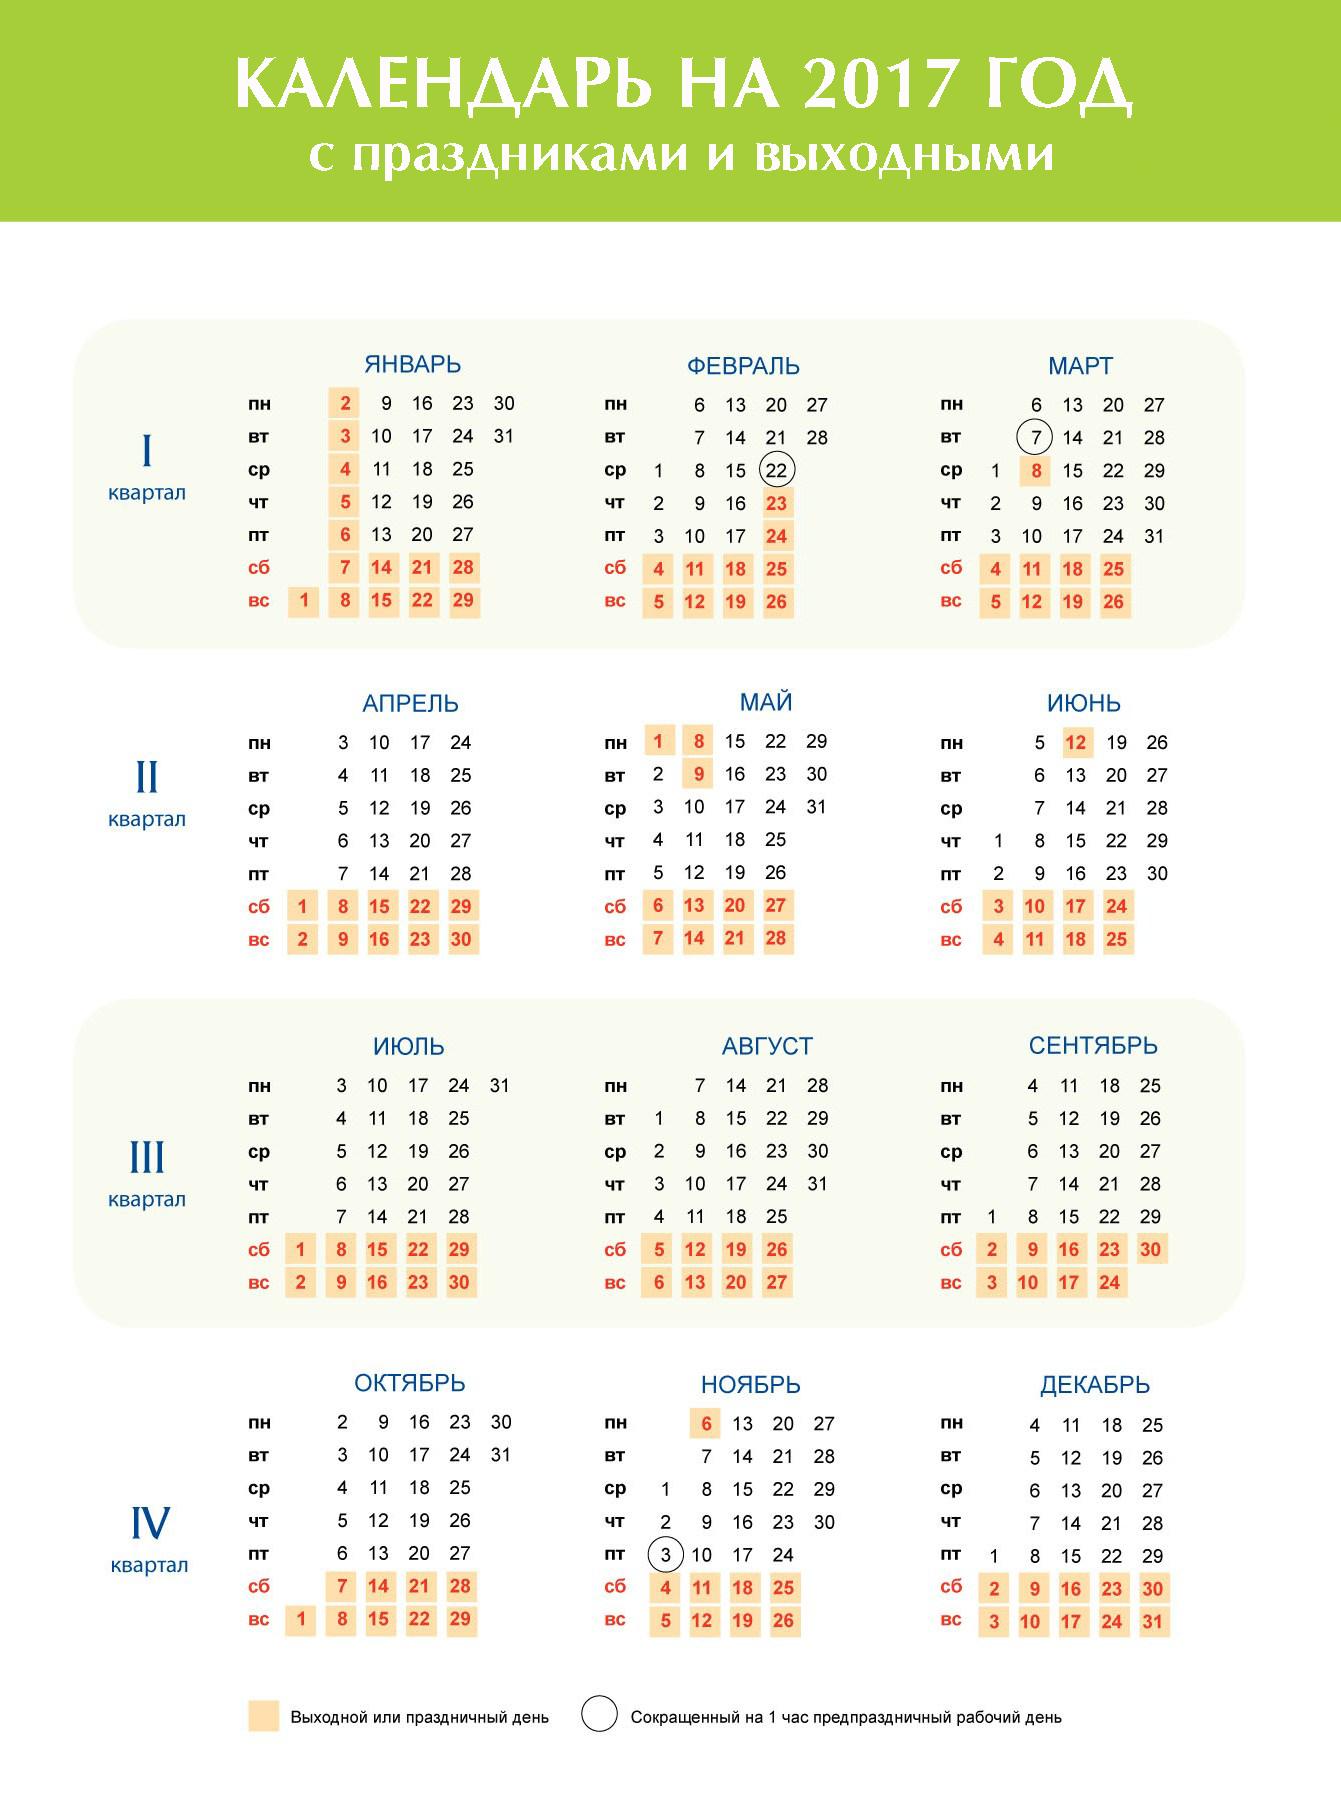 Календарь 2017-2018 для доу